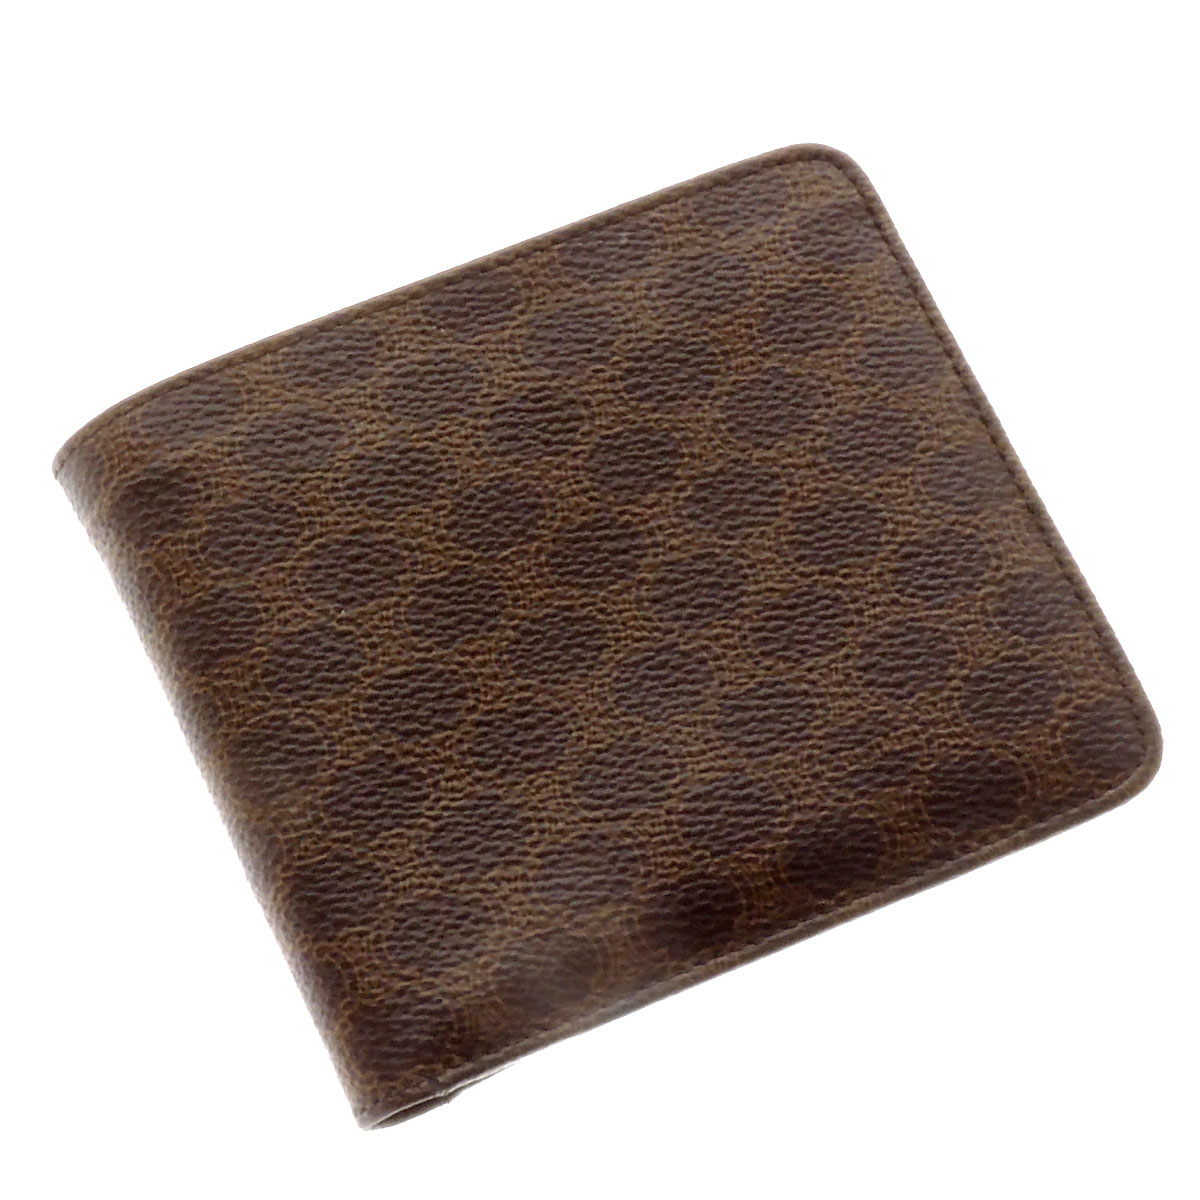 CELINE【セリーヌ】 レディース 二つ折り財布(小銭入れあり) PVCキャンバス レディース 【中古】